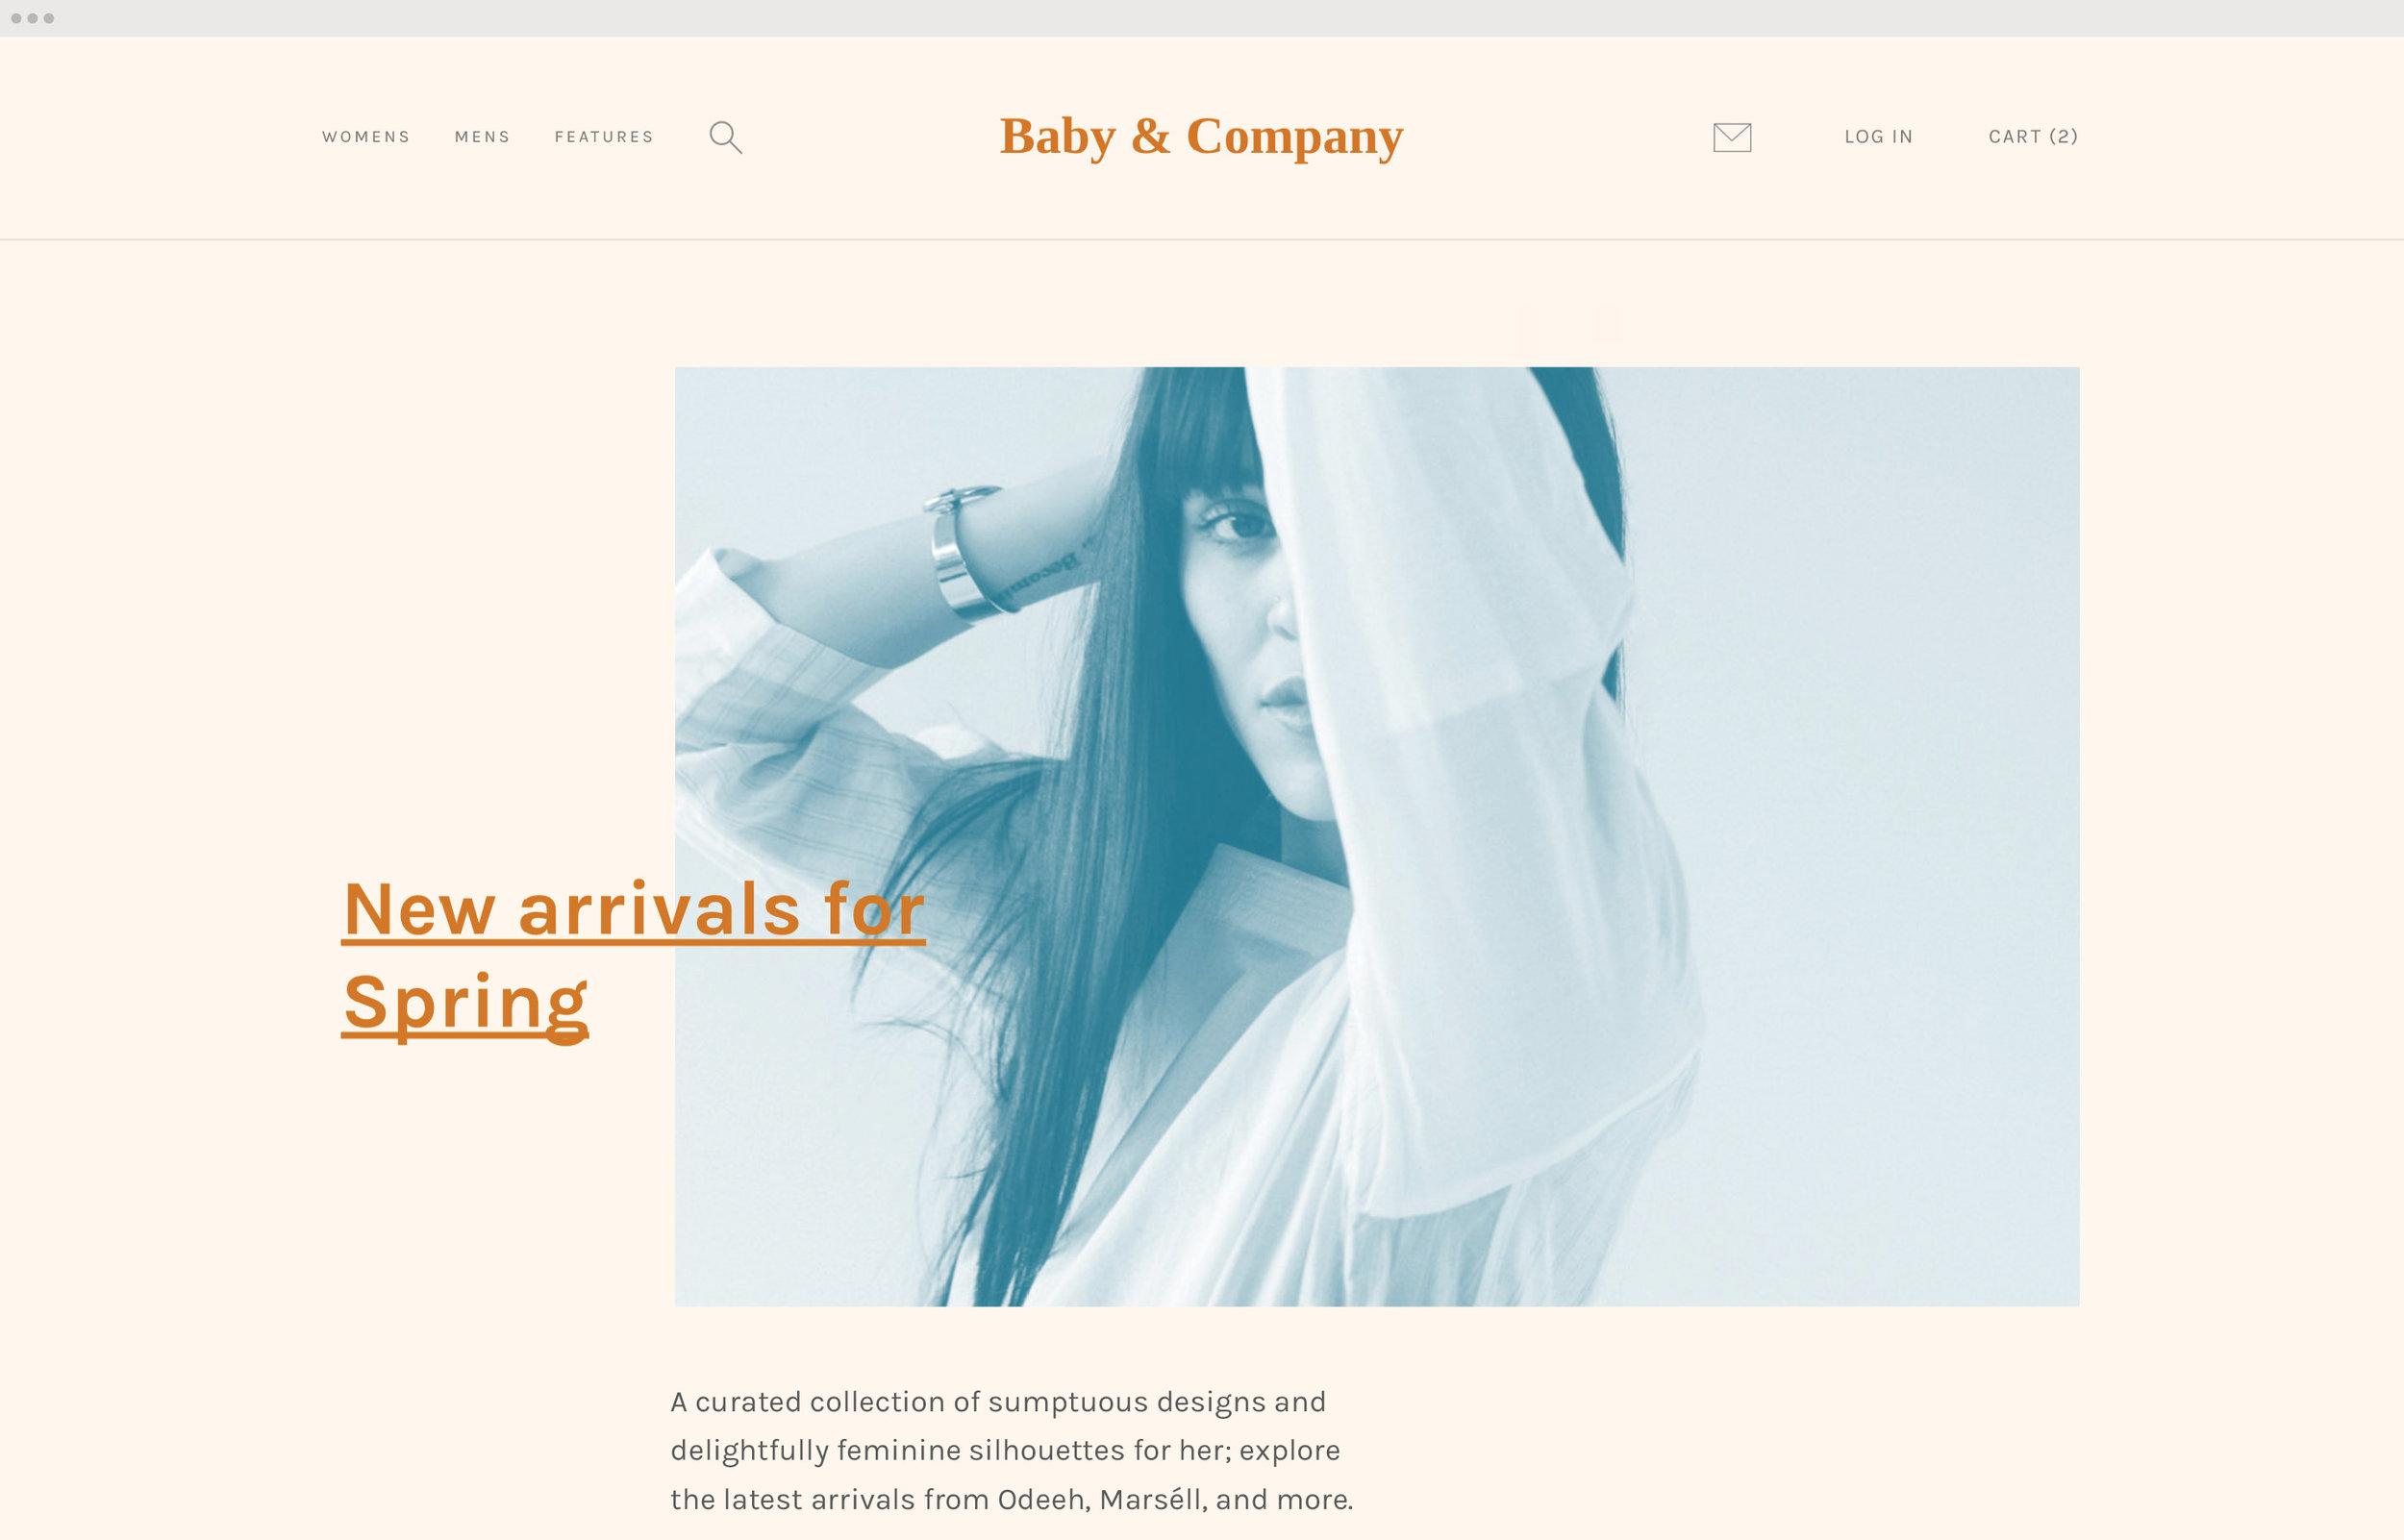 Web Tiles_2019_Web Design - B&C site customization3.jpg